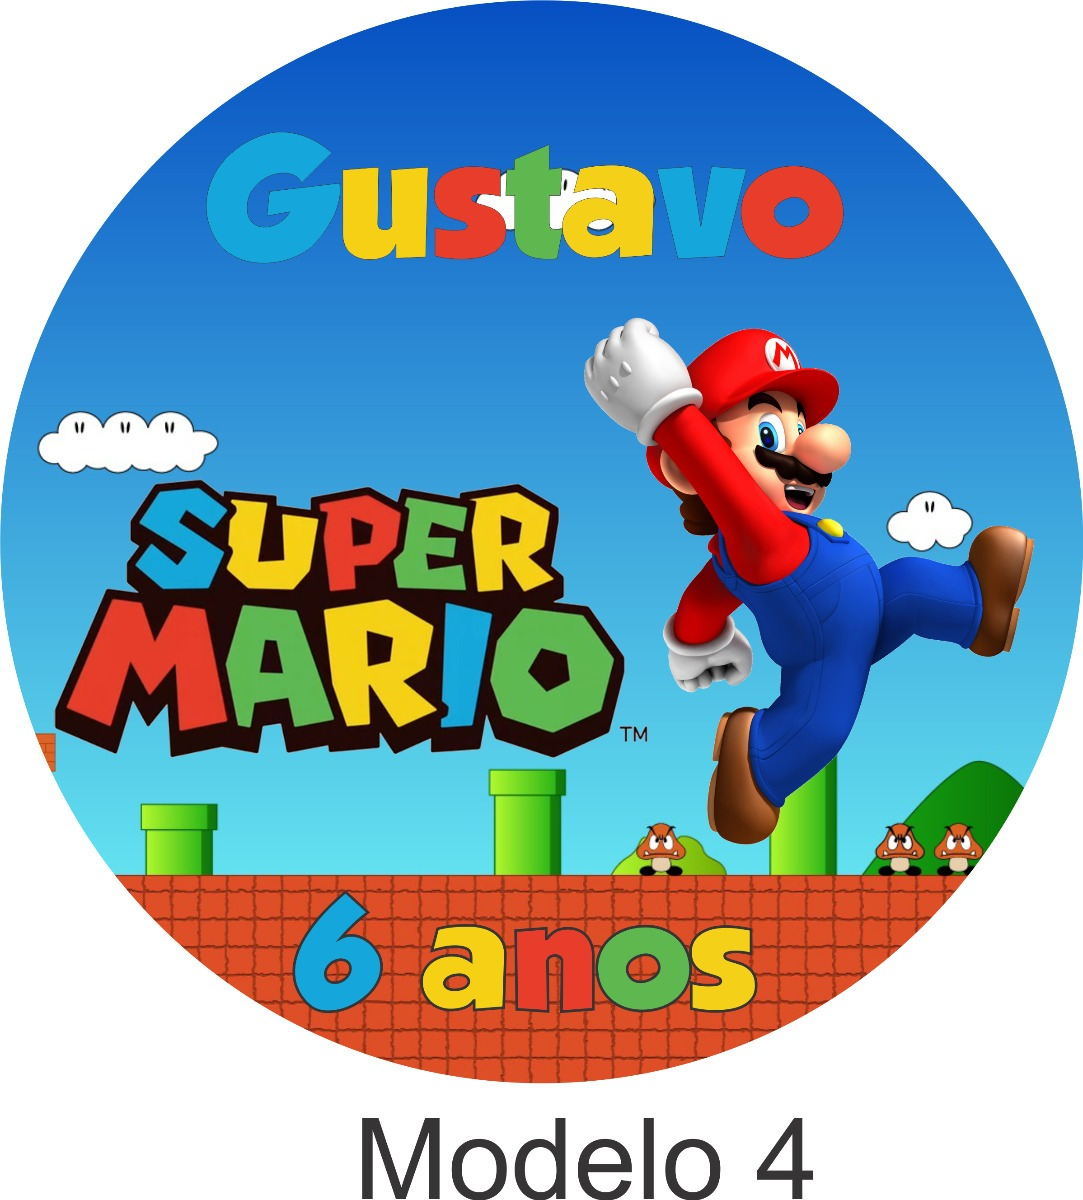 Adesivo Emagrecedor Funciona ~ 100 Tags Adesivo Mario Bros R$ 15,60 em Mercado Livre